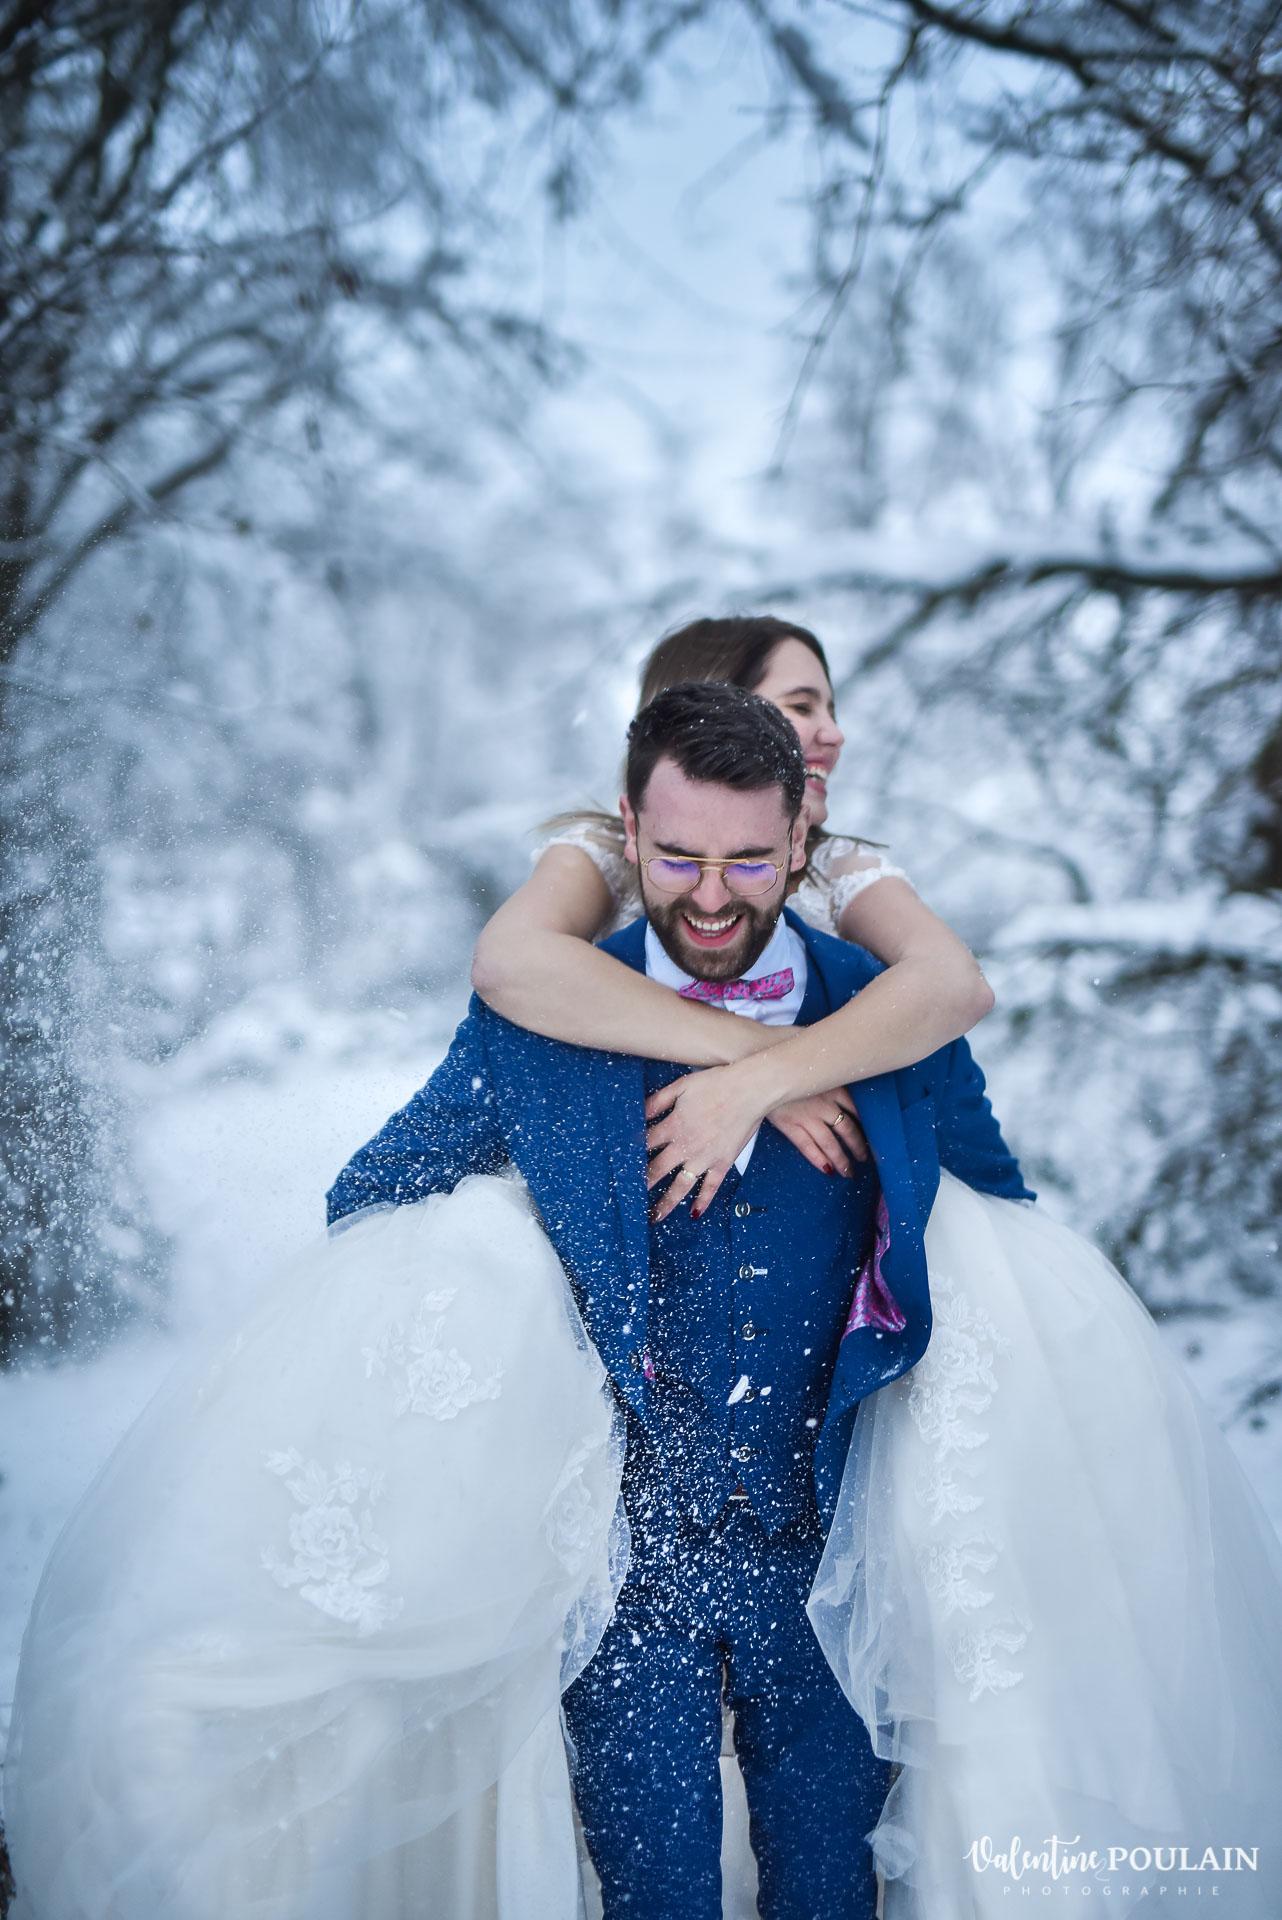 Photo mariage neige hiver - Valentine Poulain flocons